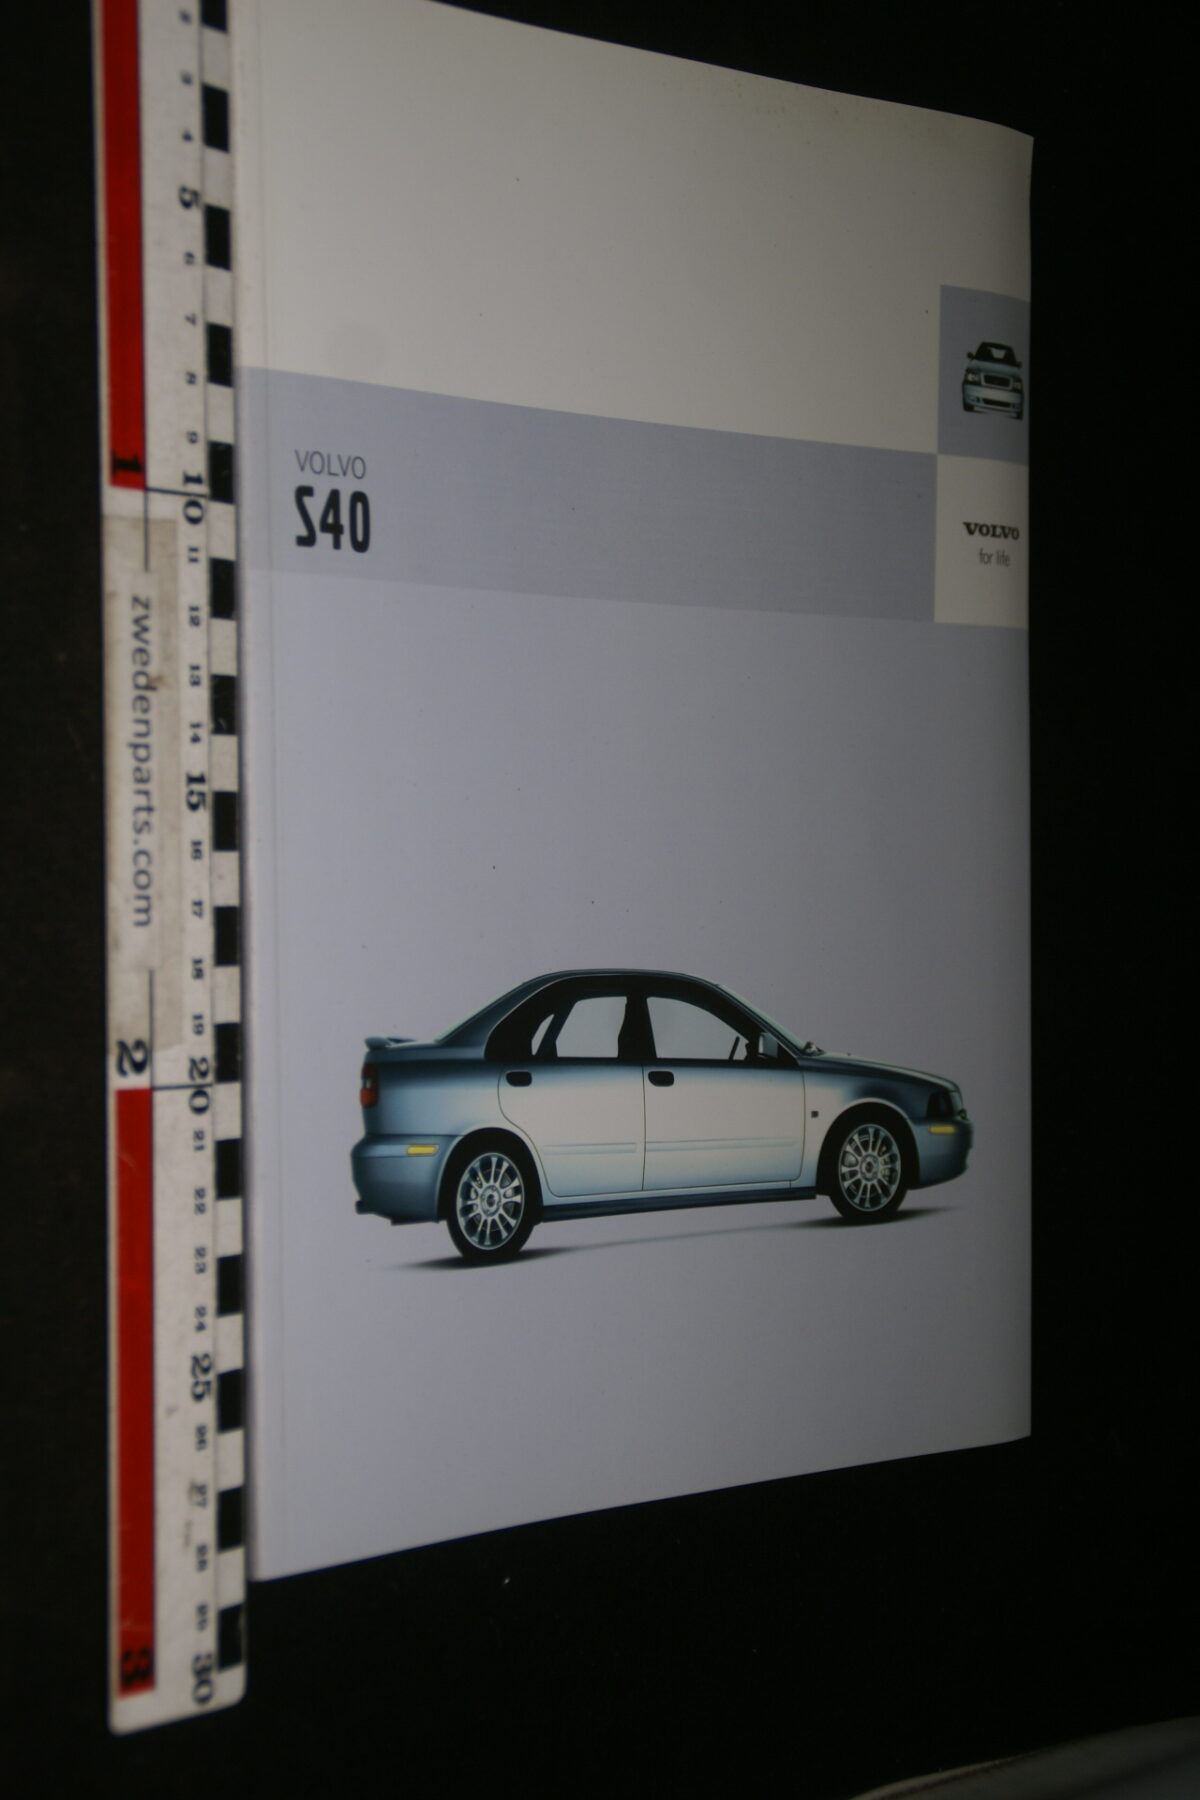 DSC05014 2003 originele brochure nr. MSPV 527 MY04 0103 V1 Volvo S40-f186eb5c